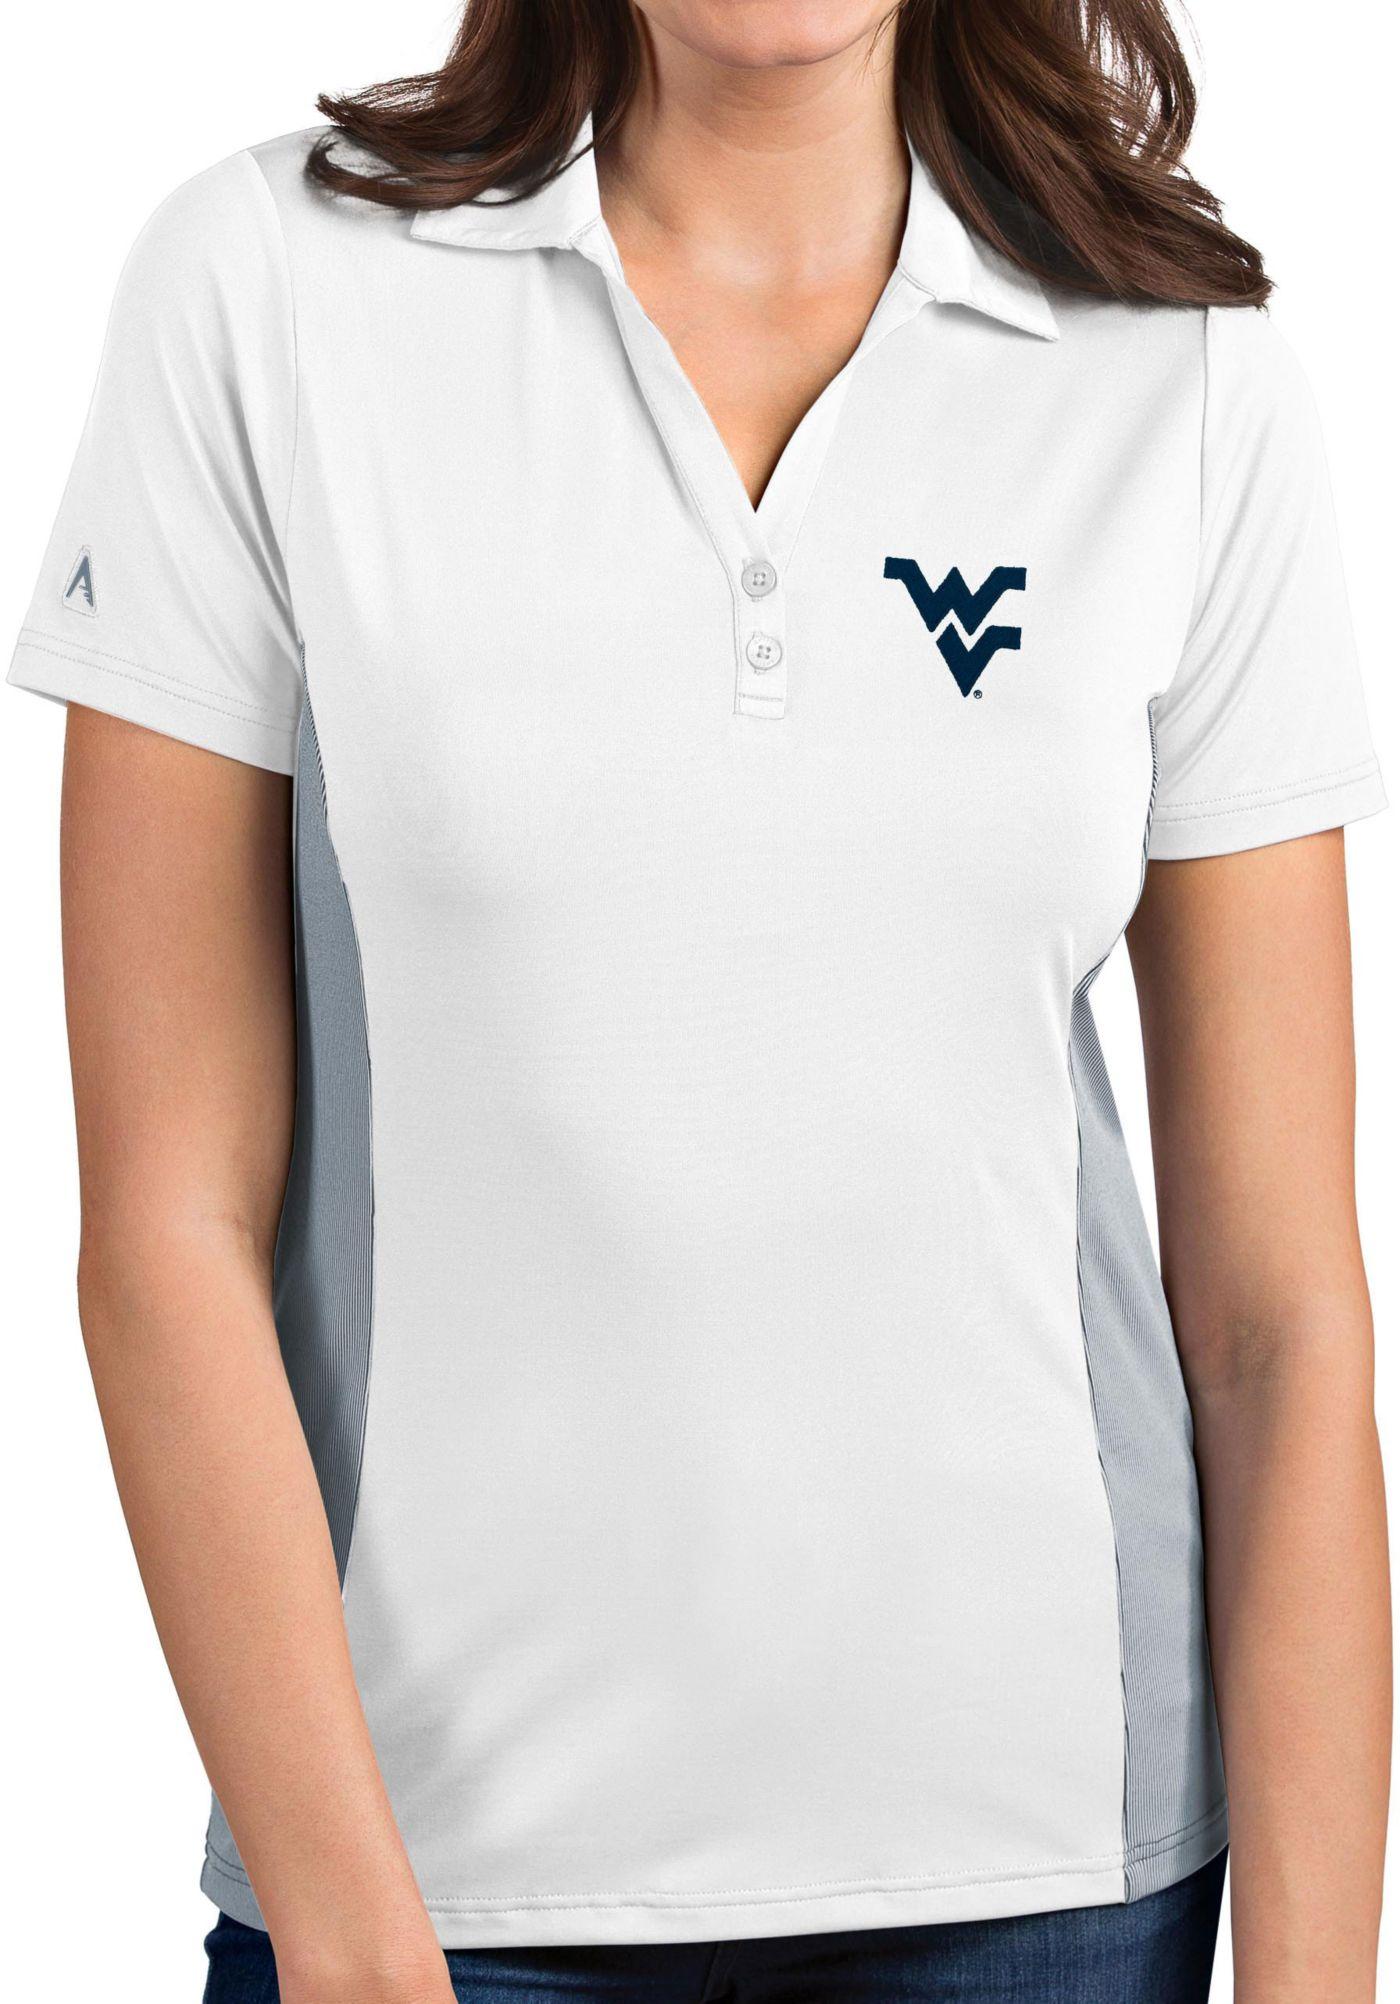 Antigua Women's West Virginia Mountaineers Venture White Polo